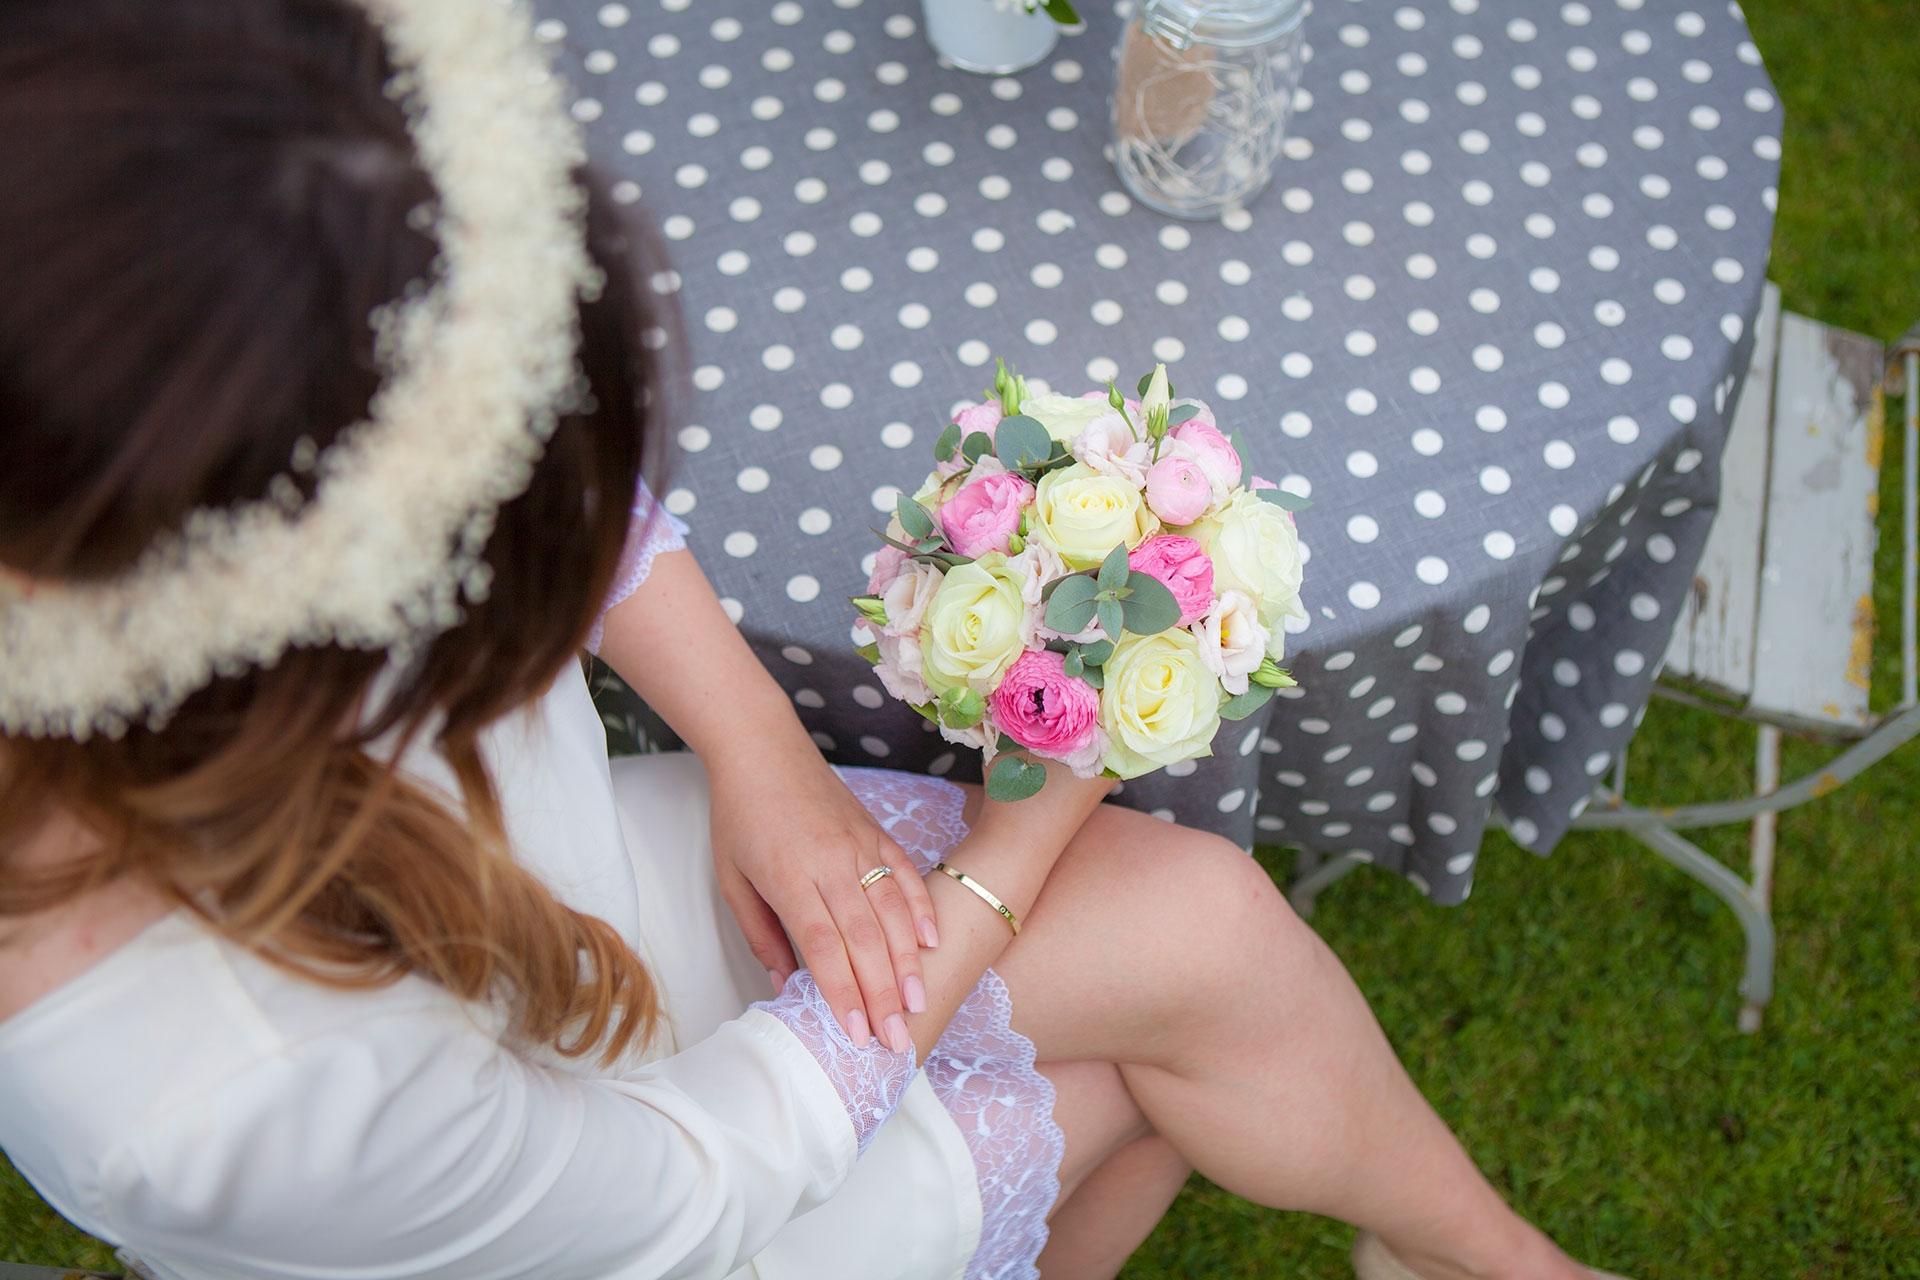 particuliers-evenements-mariages-oui-zelie&valentin-31